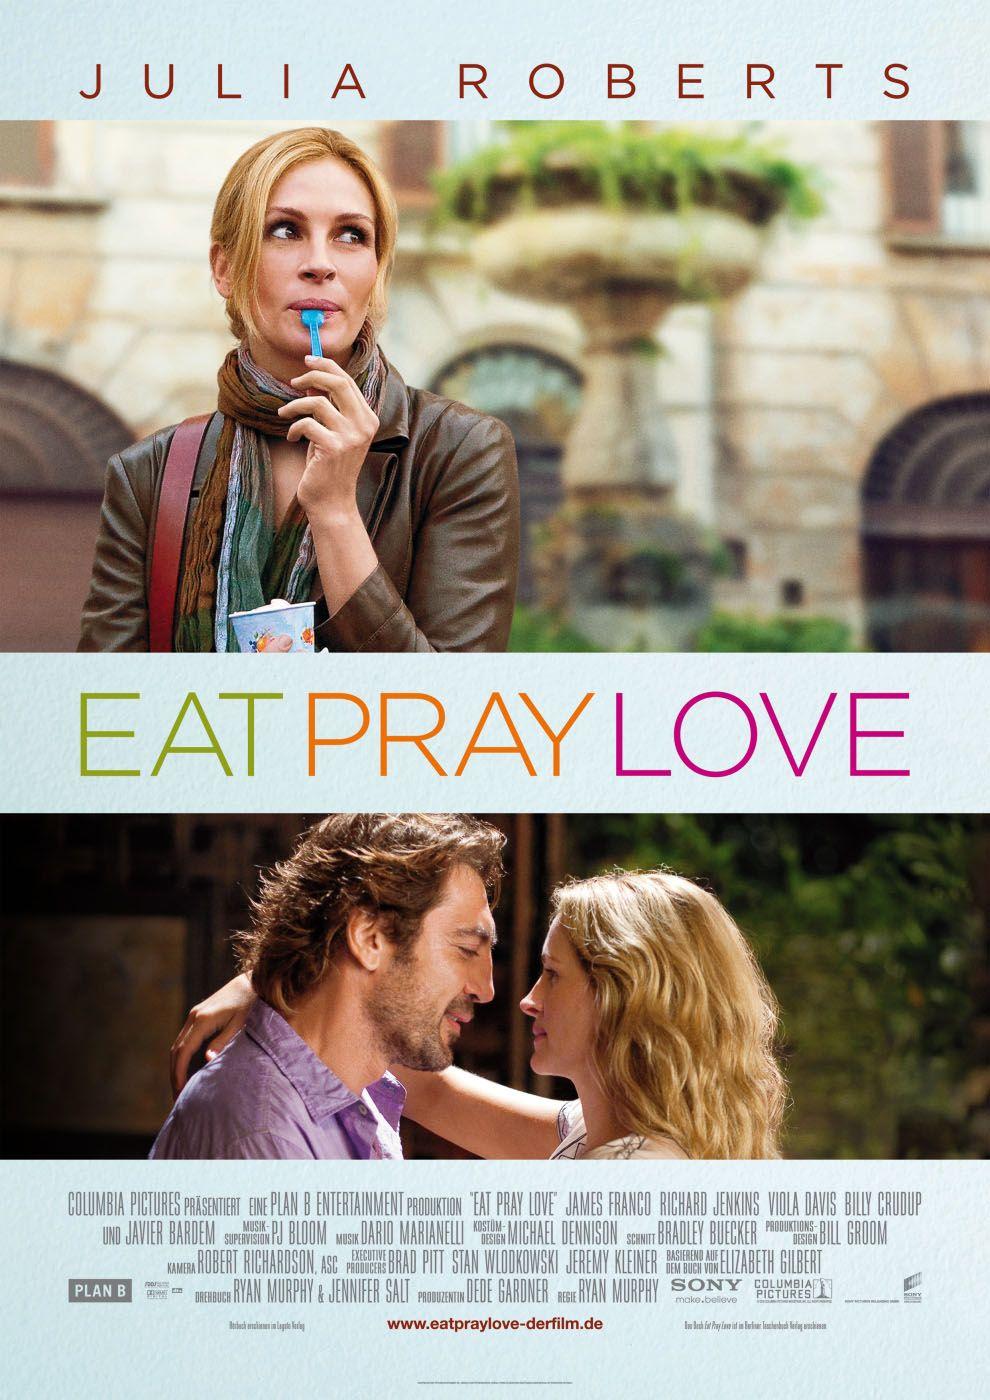 eat pray love - julia roberts | favori filmler | pinterest | movie